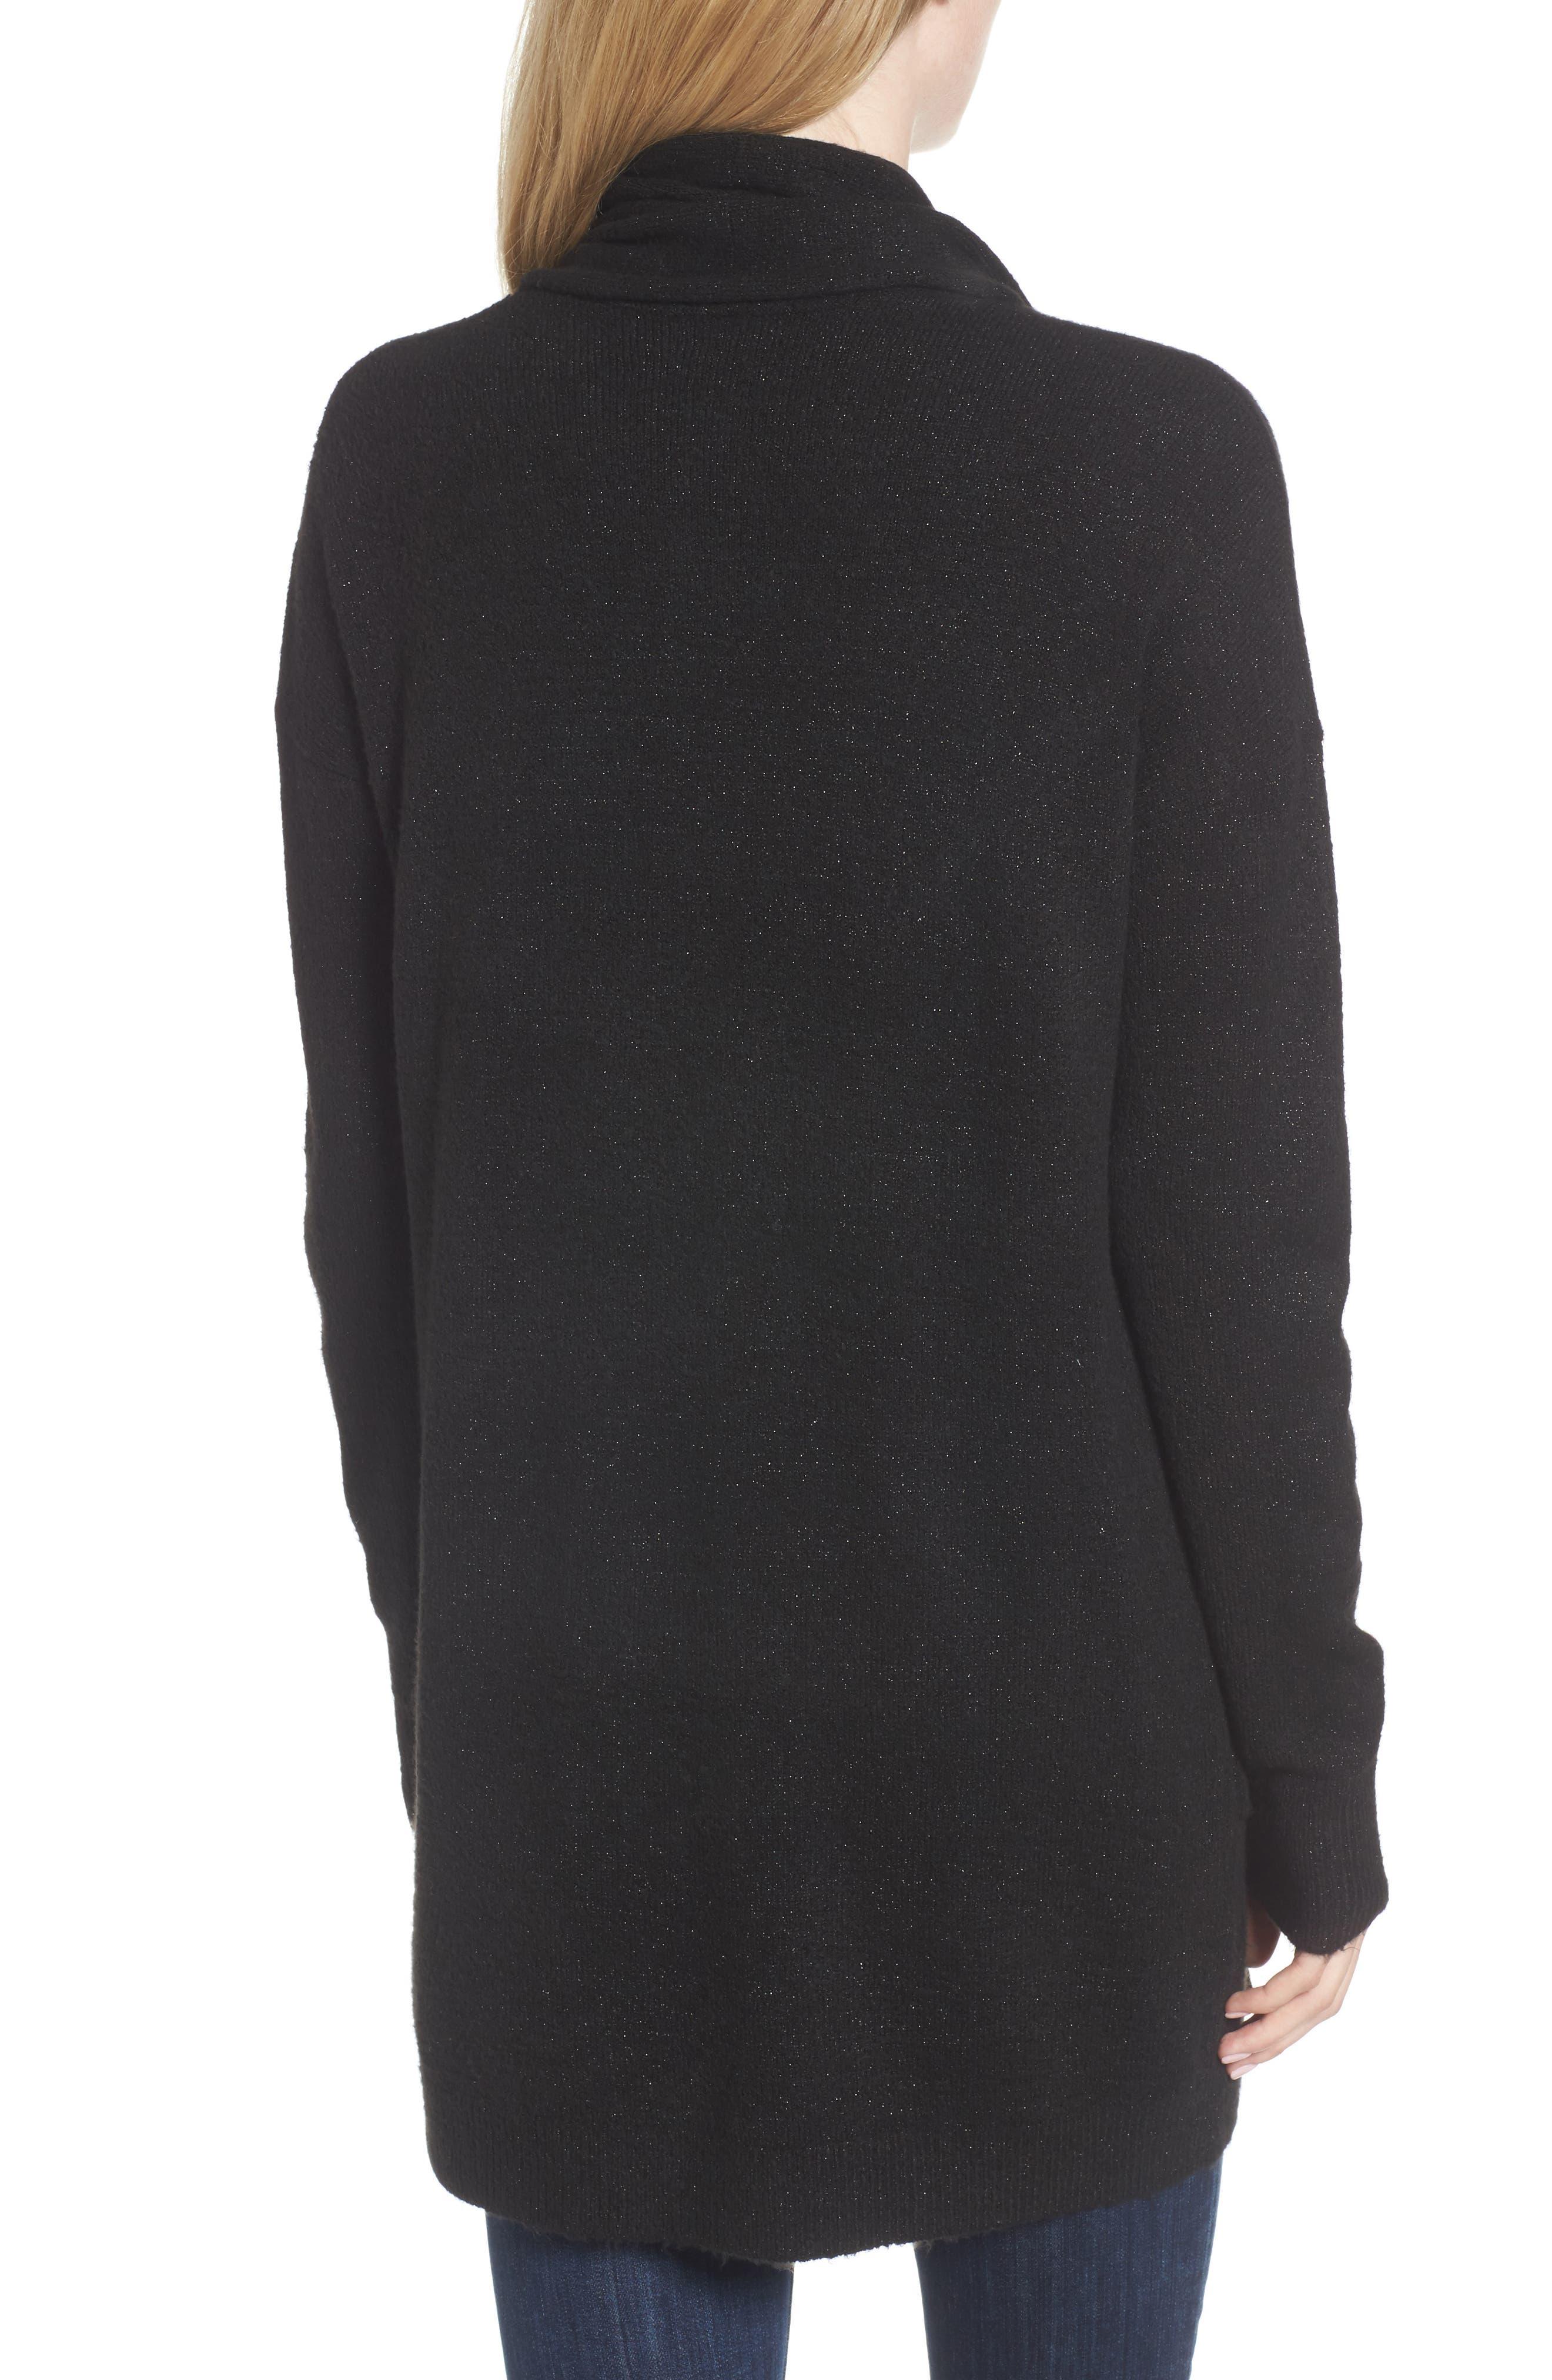 Cardigan Sweater,                             Alternate thumbnail 2, color,                             001